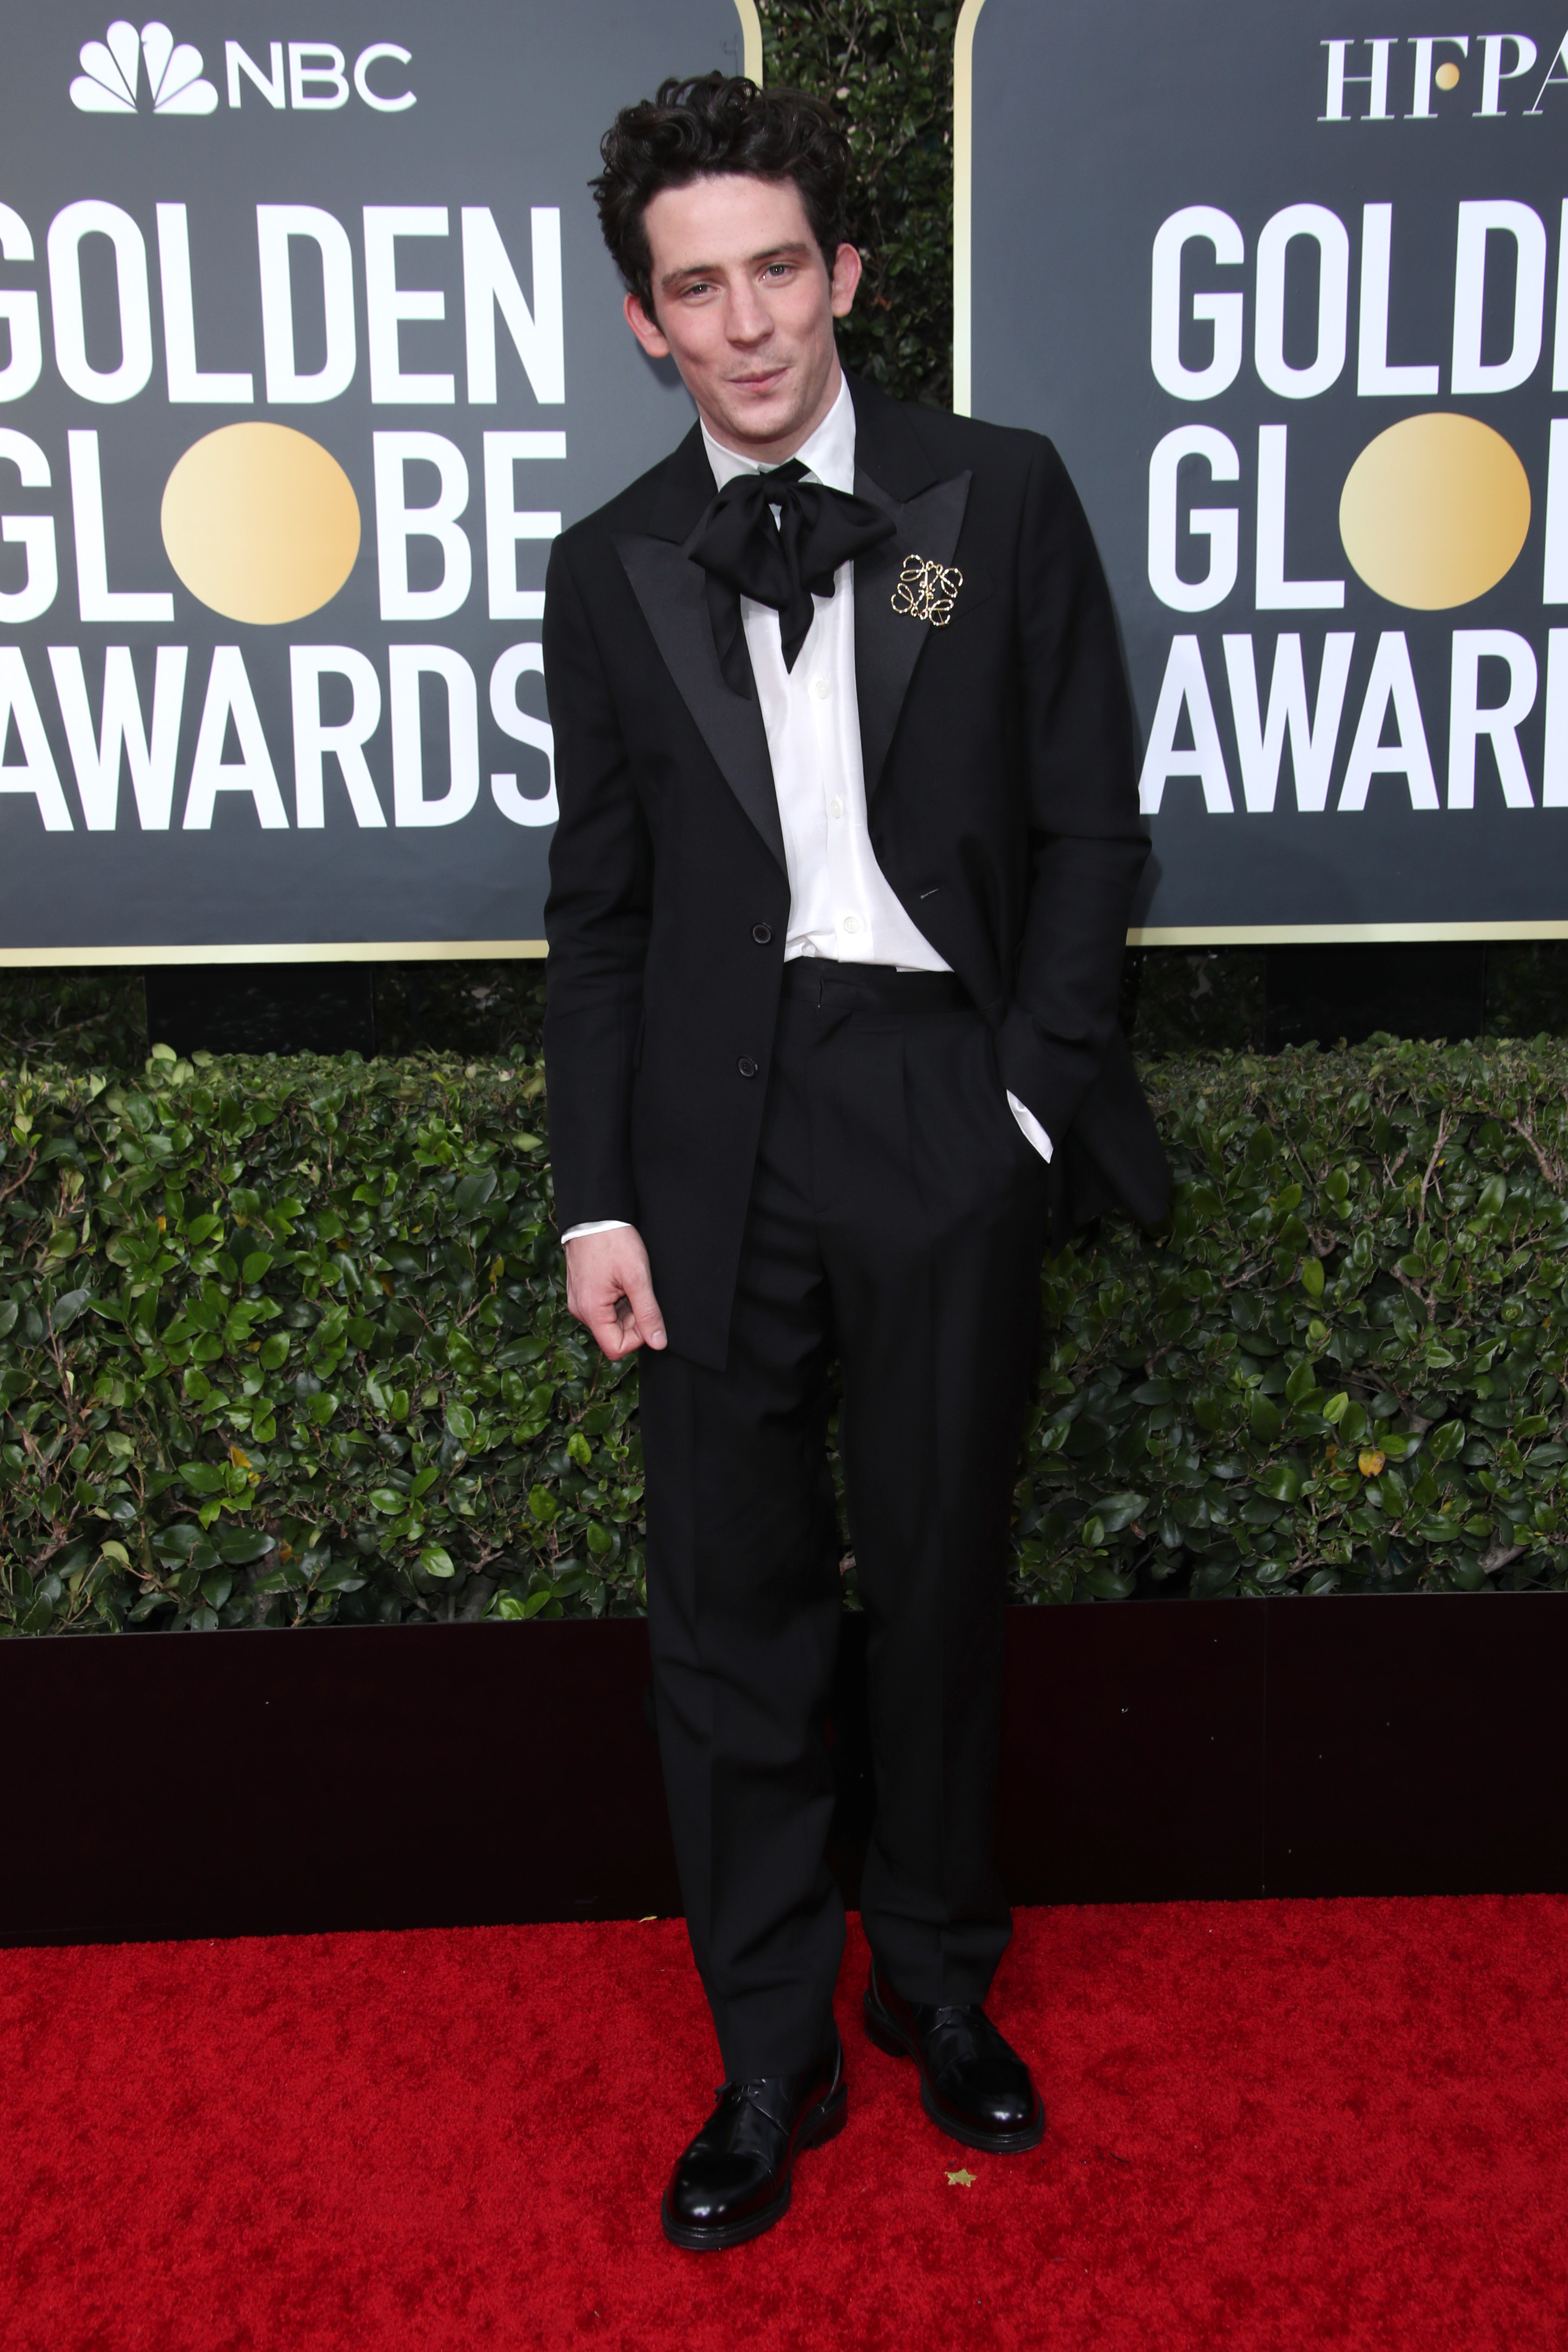 Josh O'Connor77th Annual Golden Globe Awards, Arrivals, Los Angeles, USA - 05 Jan 2020